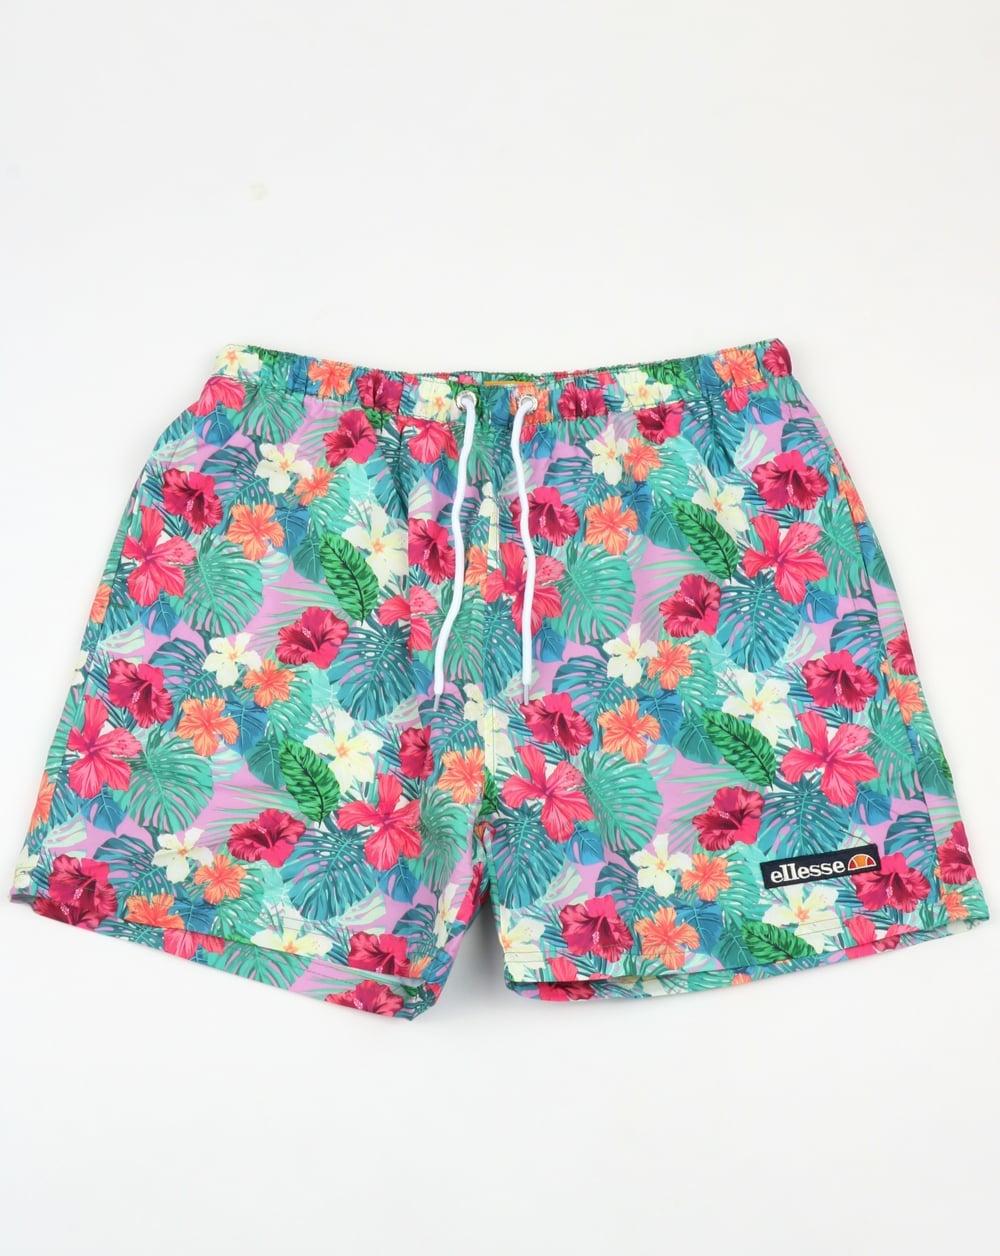 ellesse floral beach swim shorts